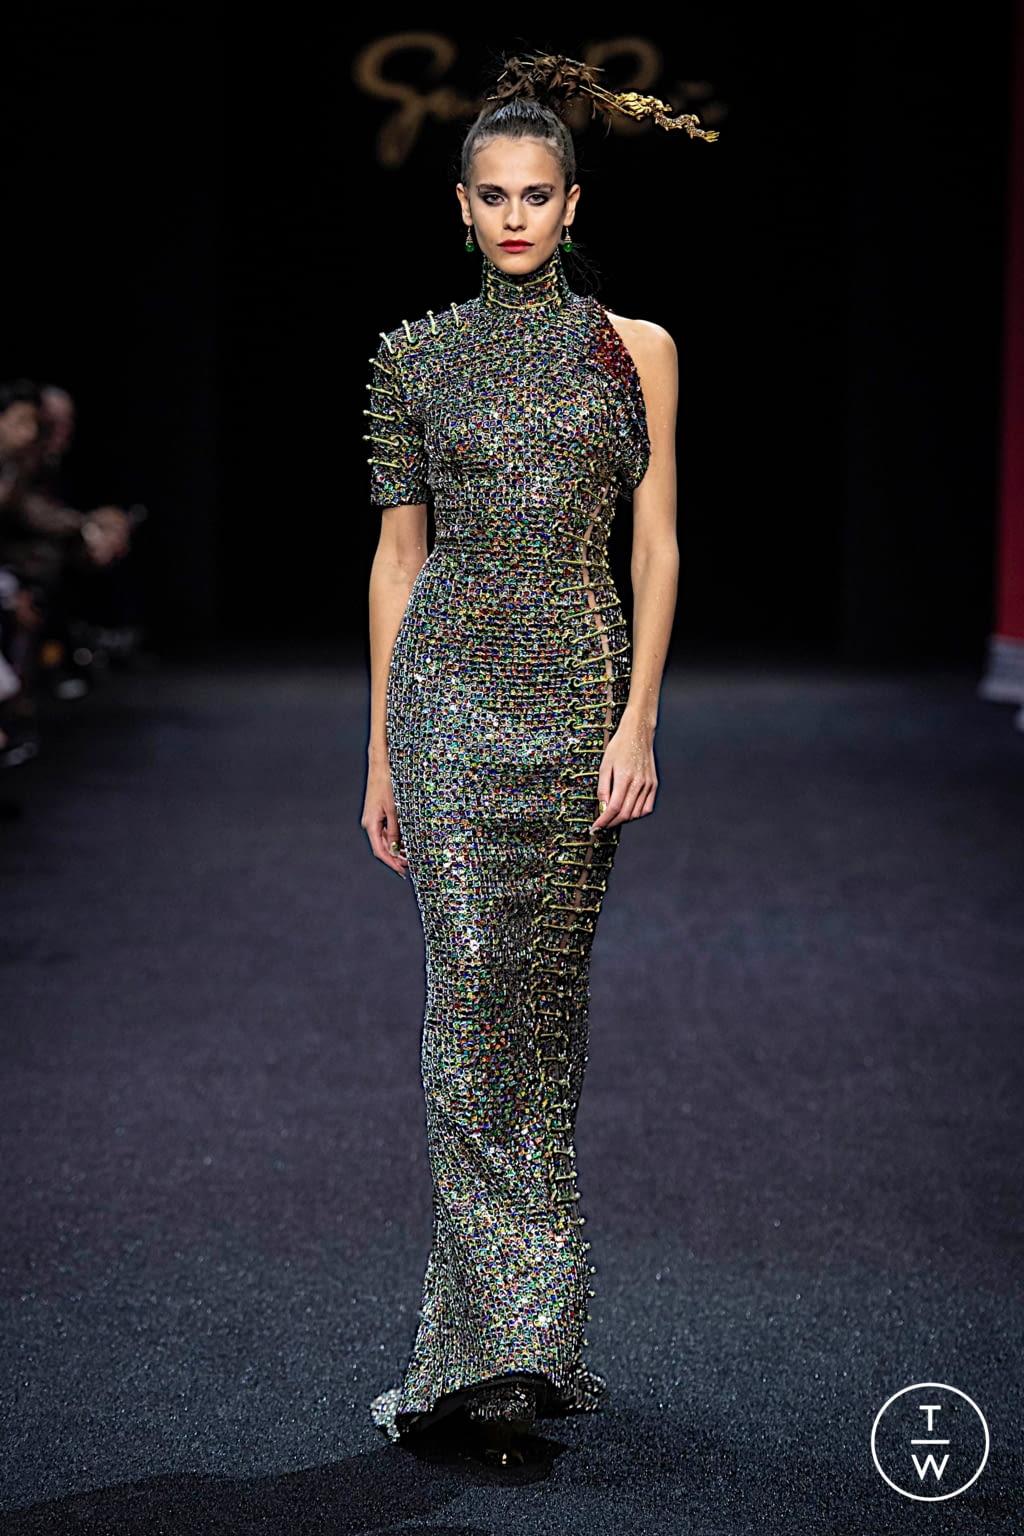 Fashion Week Paris Spring/Summer 2019 look 13 de la collection Guo Pei couture